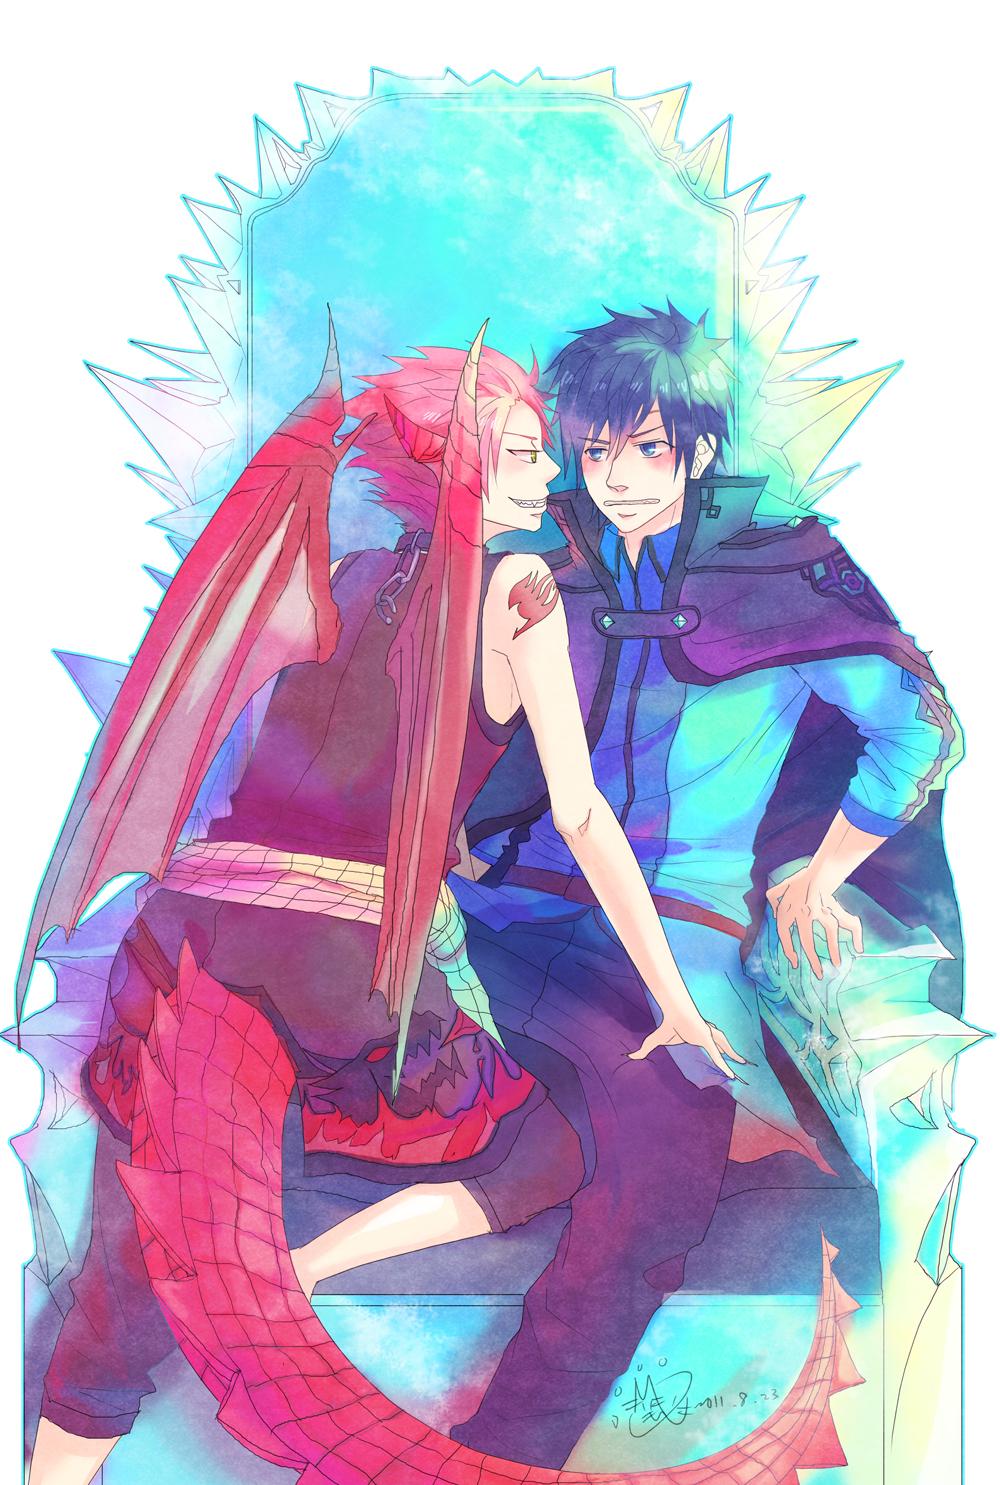 Fairy tail anime plot